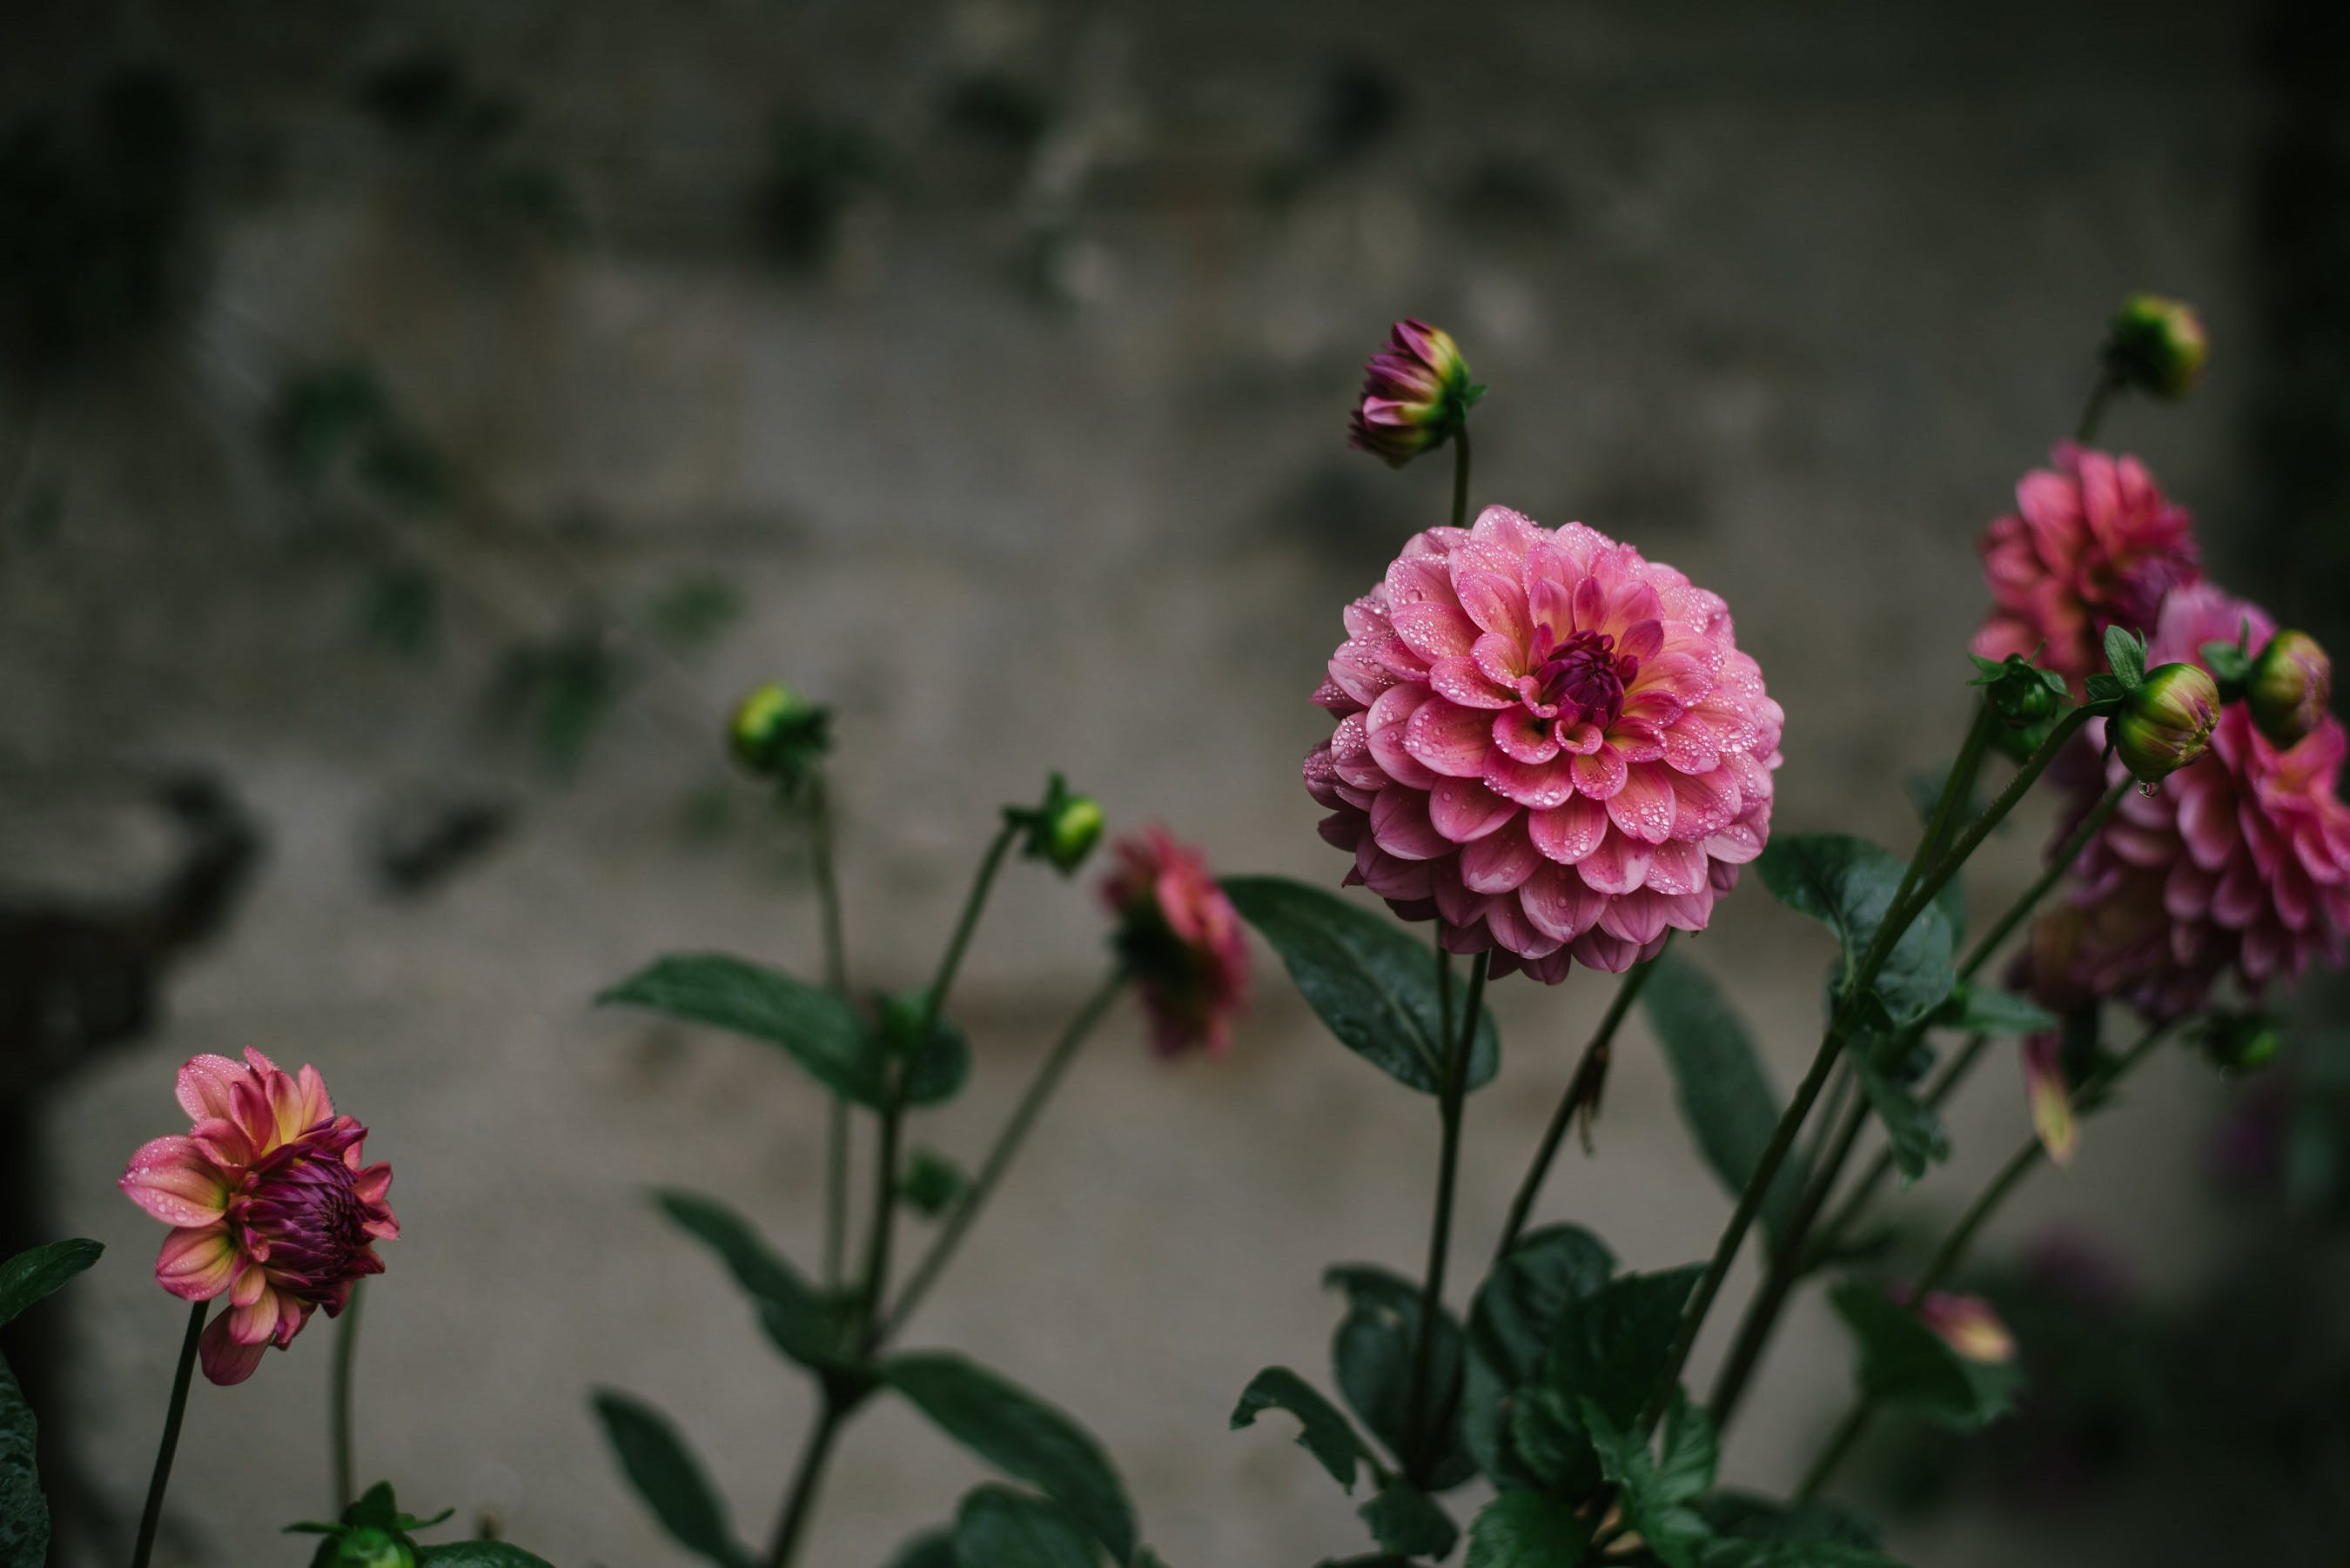 Kostenloses Stock Foto zu blume, blütenblatt, farbe, flora